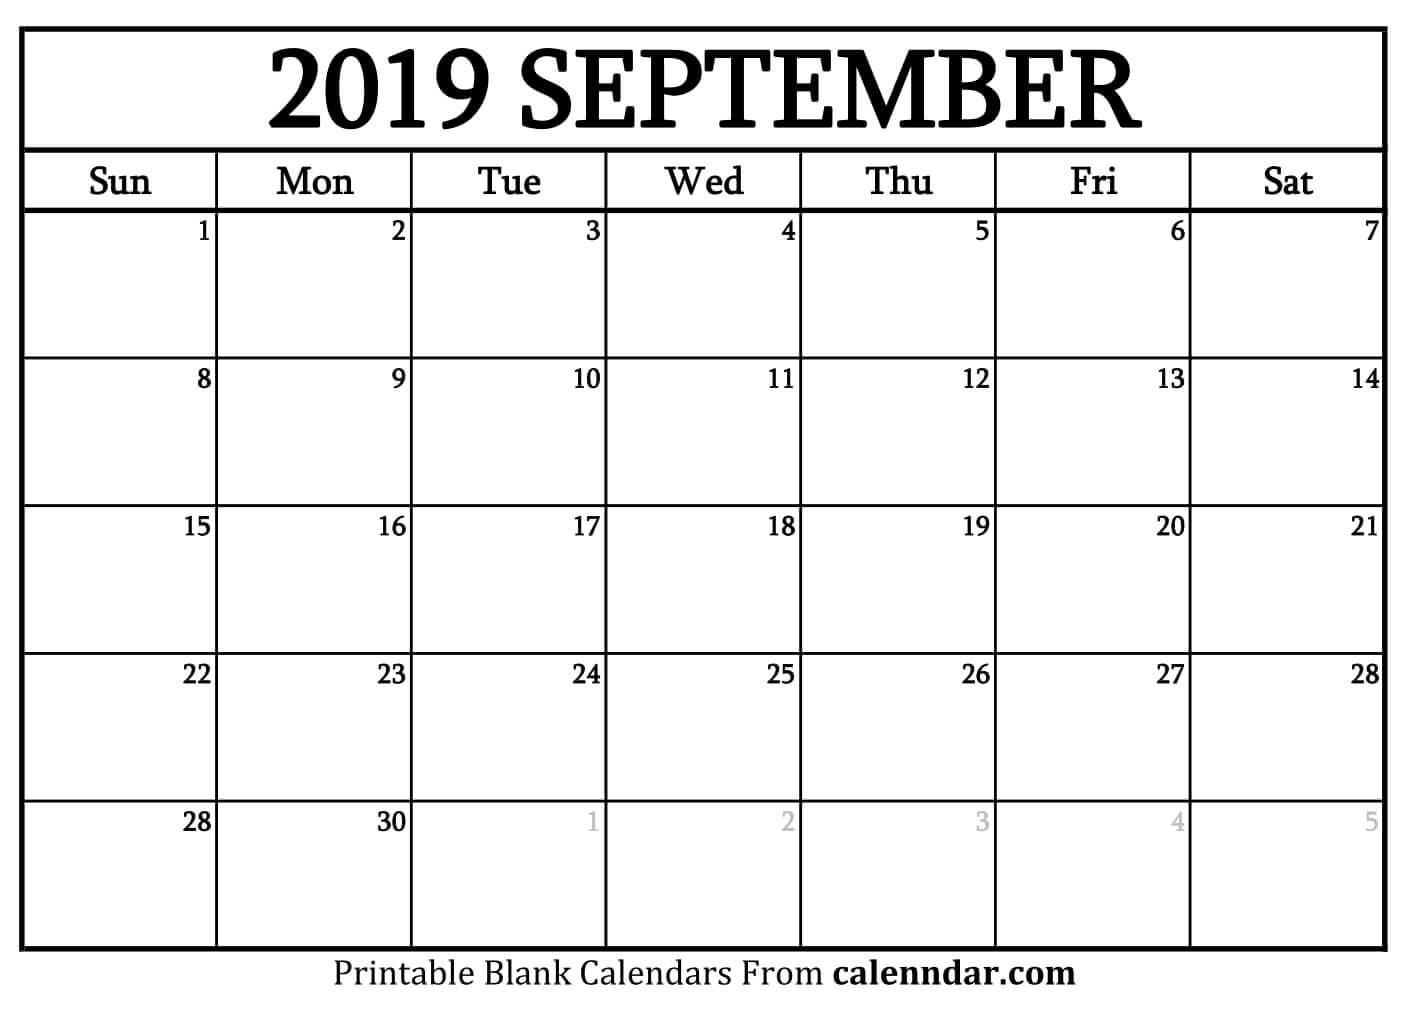 Blank September 2019 Calendar Templates – Calenndar Calendar Of 2019 September